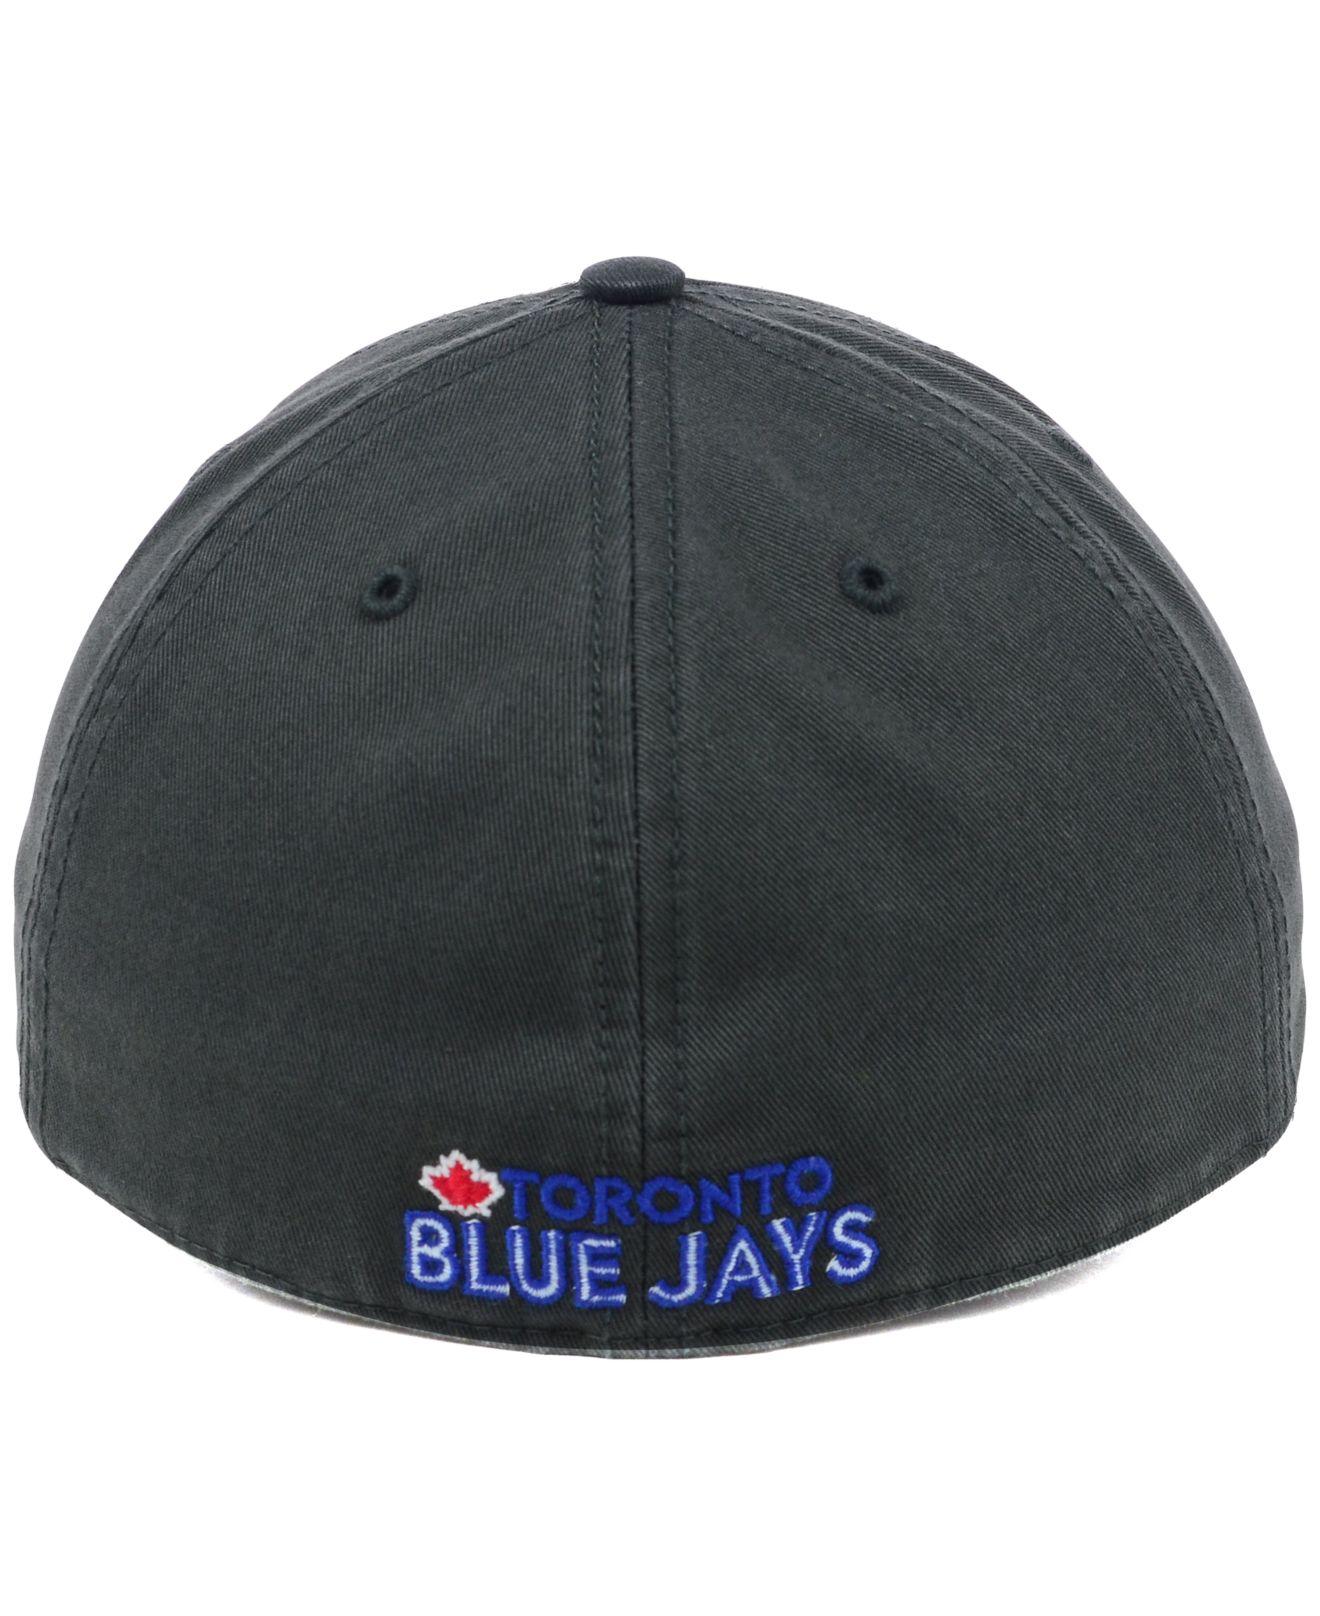 online store f2763 39db8 toronto blue jays new era 2017 mlb memorial day 39thirty cap  clearance  toronto blue jays memorial day hat 07 d0d66 ed22f